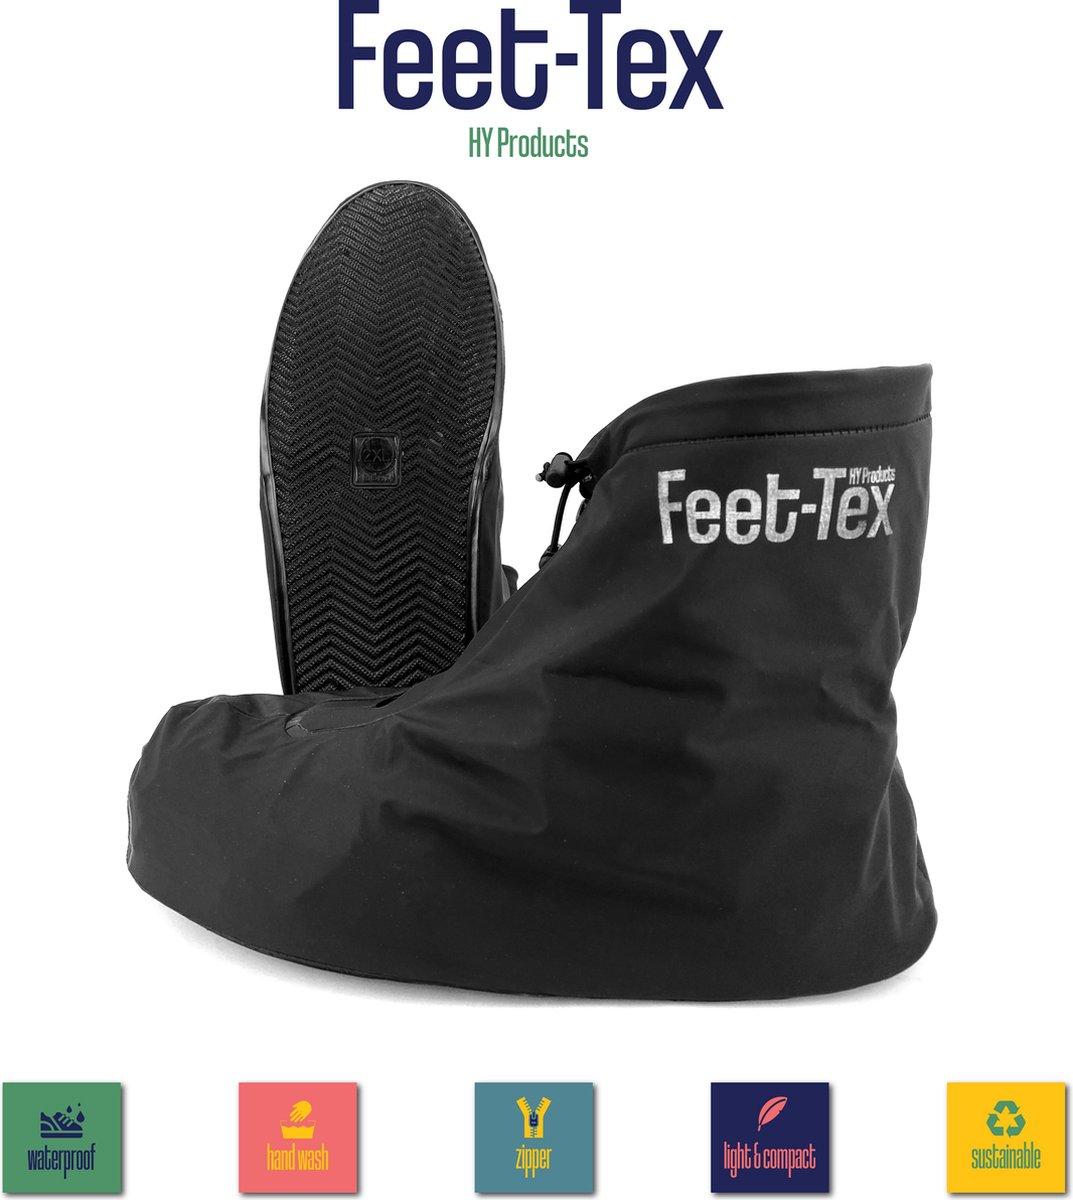 Feet Tex Regen Overschoenen - Duurzaam - Anti Slip - Waterdicht